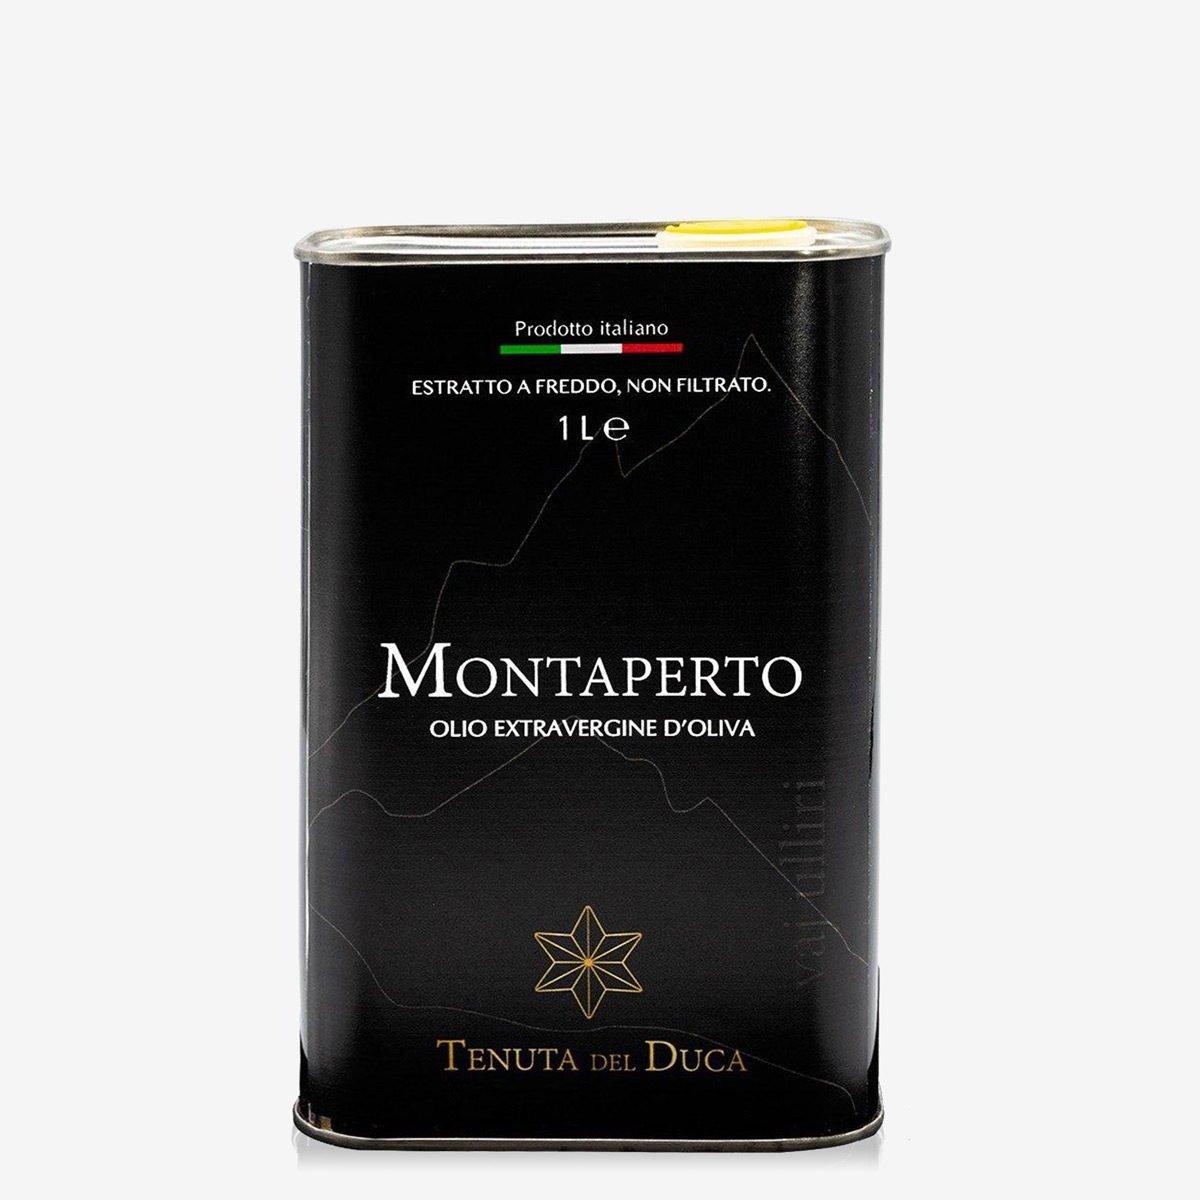 1L Montaperto Latta Olio -Tenuta del Duca.jpg